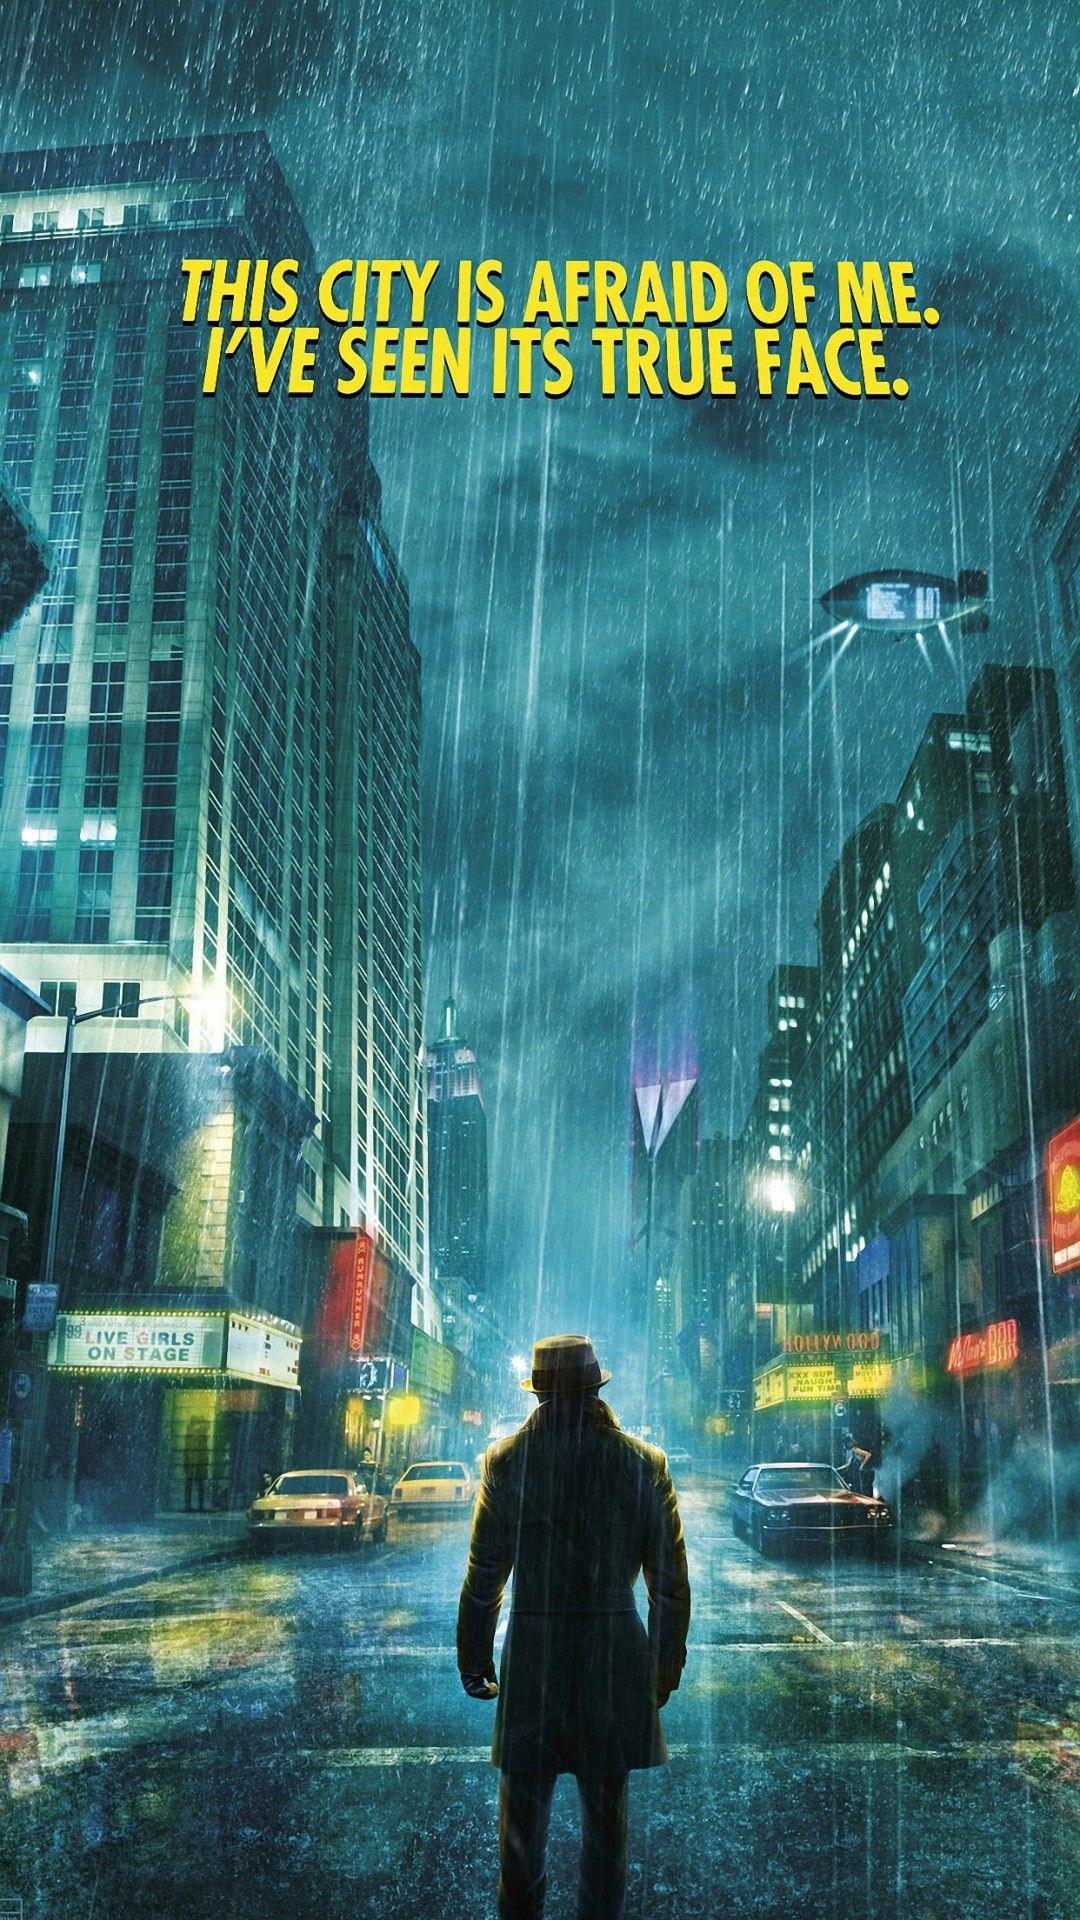 75 Watchmen Wallpapers On Wallpaperplay Movie Wallpapers Watchmen Hd Wallpaper